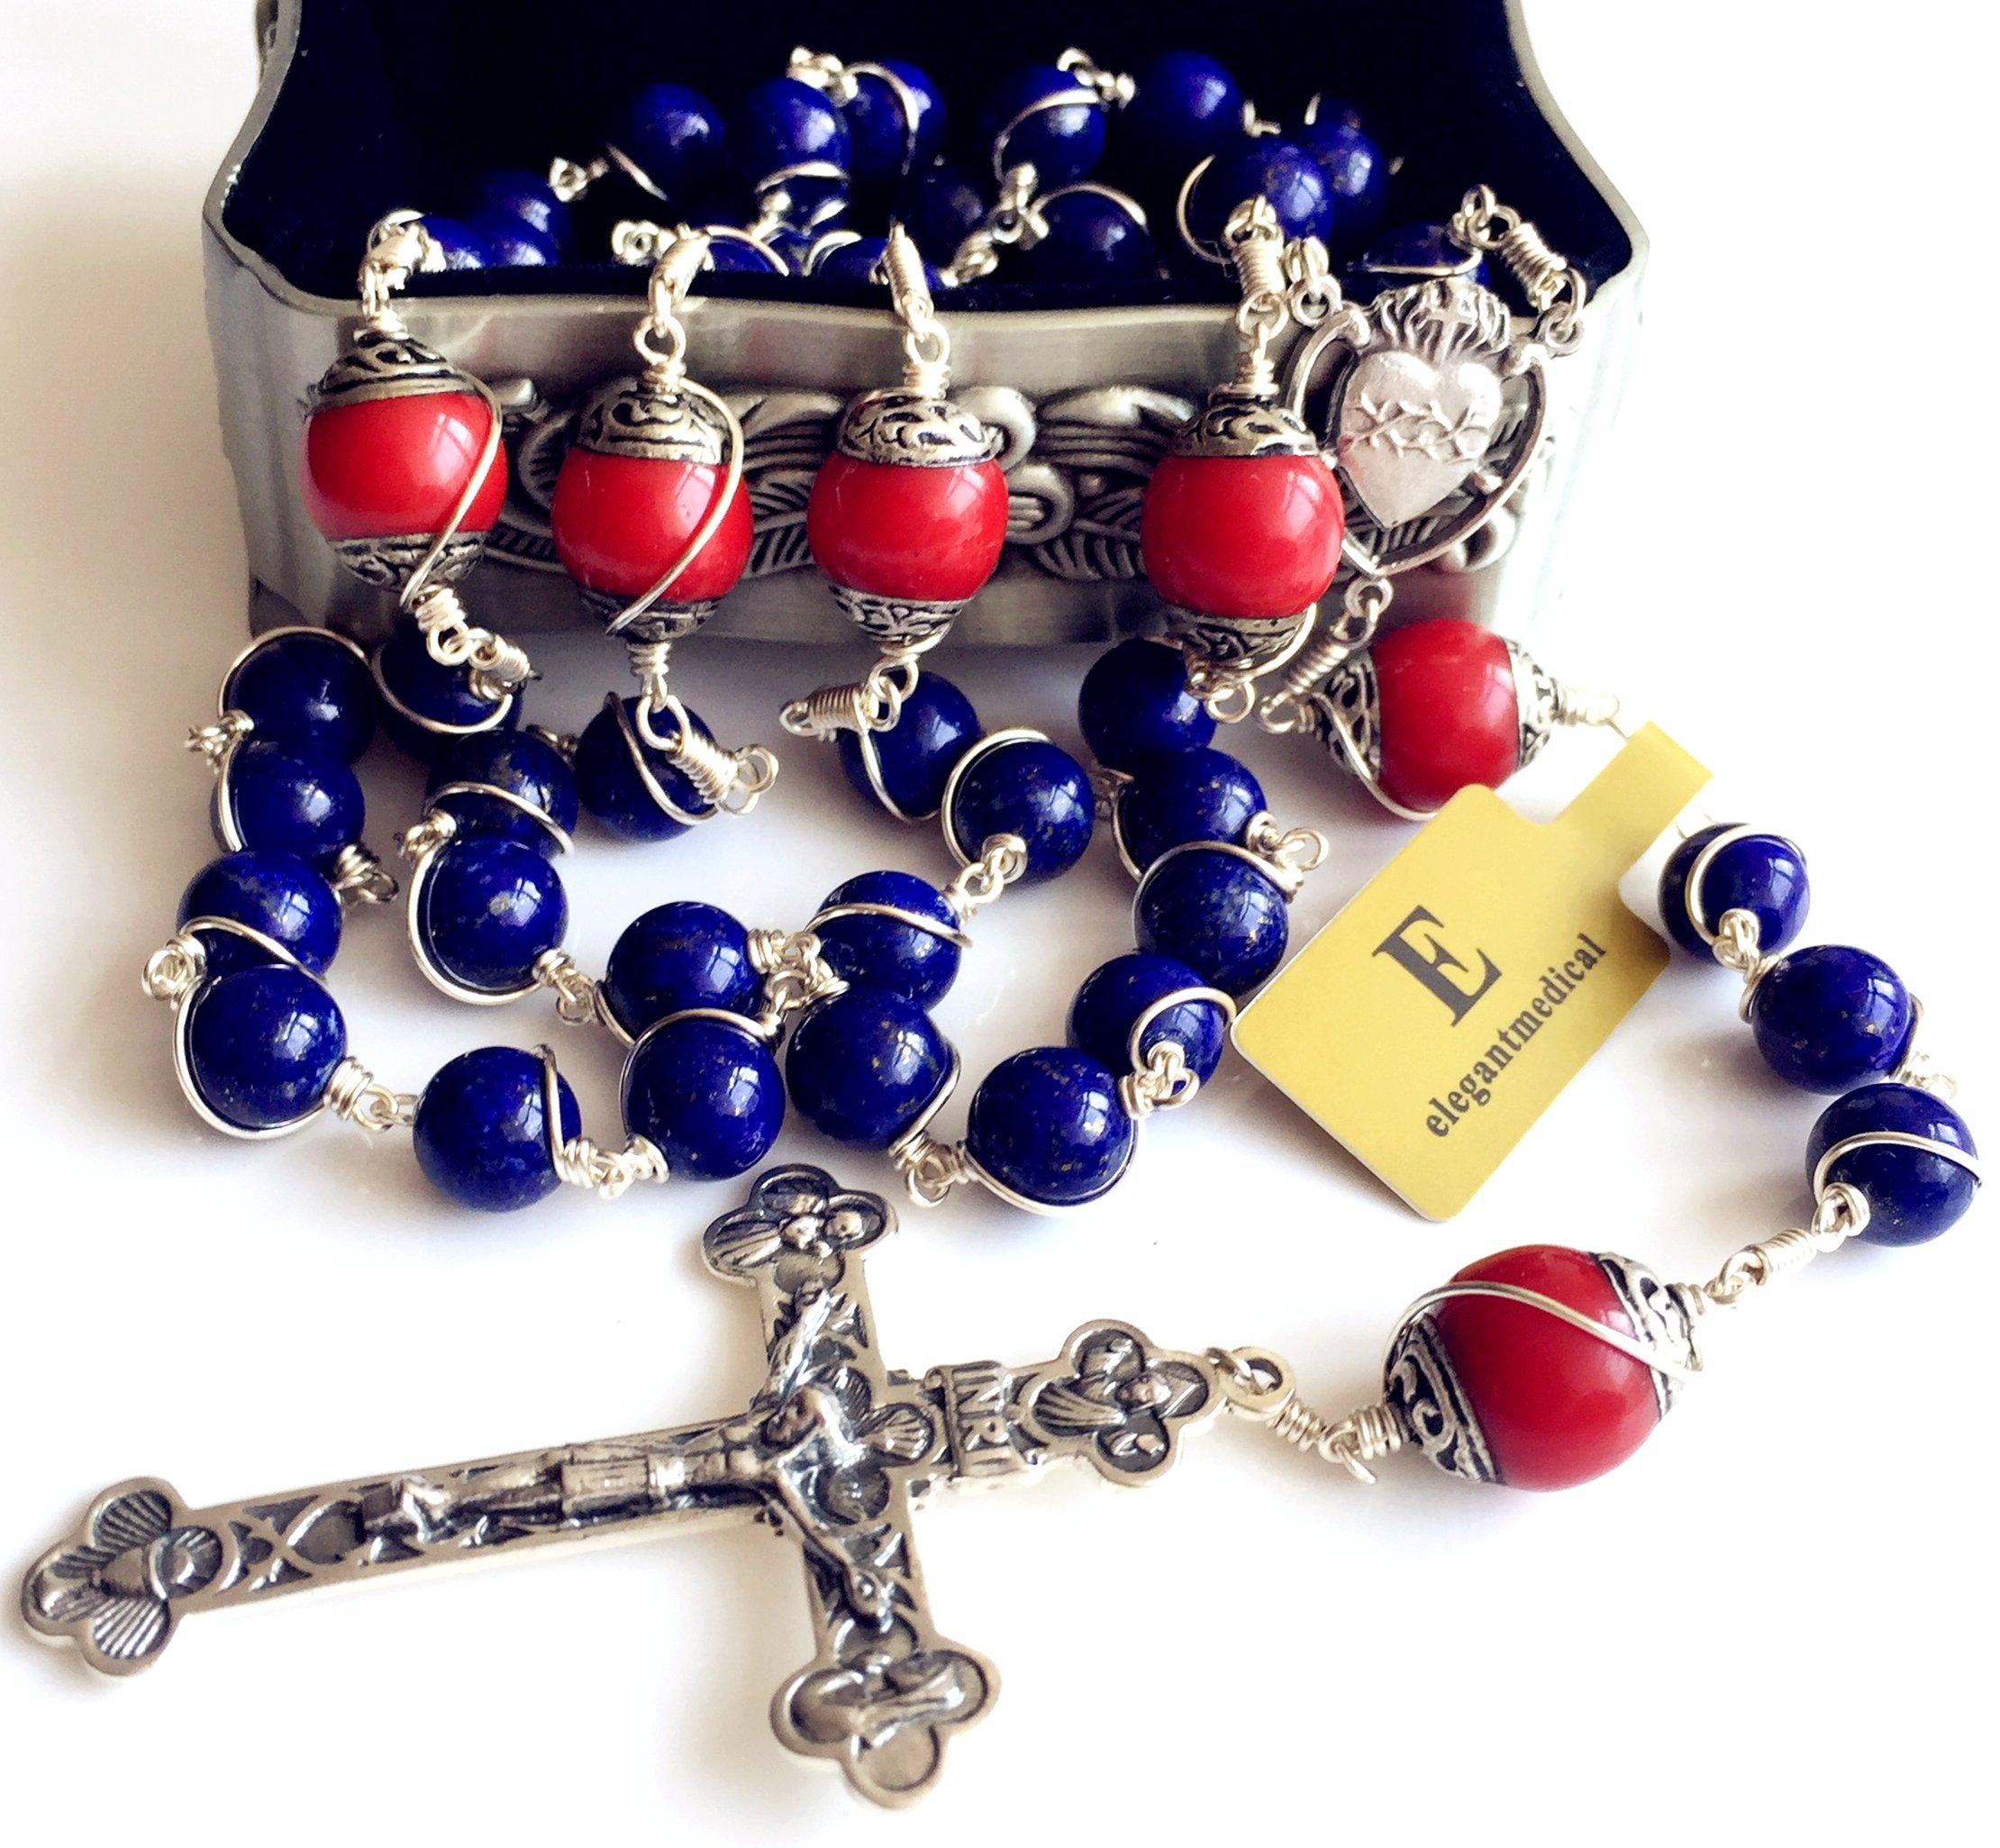 Handmade Sterling 925 Silver Lapis Lazuli Beads Rosary Cross Crucifix Catholic Necklace Gifts by elegantmedical (Image #4)